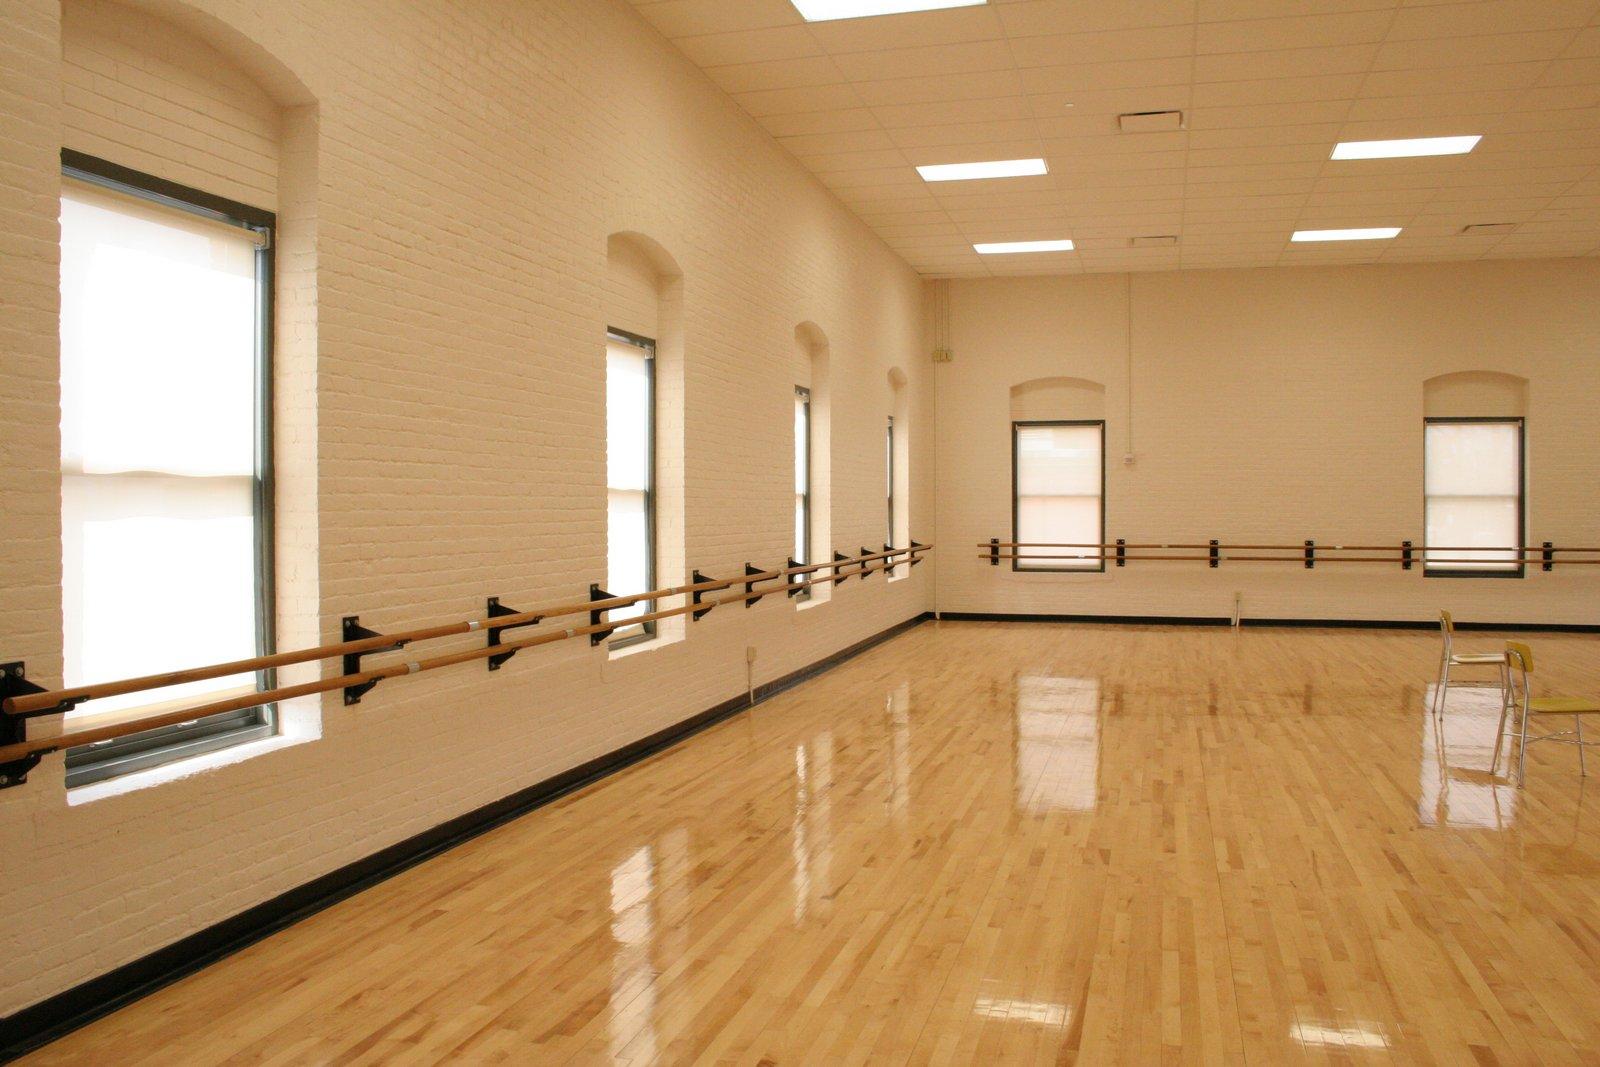 FtH_building 63 interior dance studio after 3.jpg